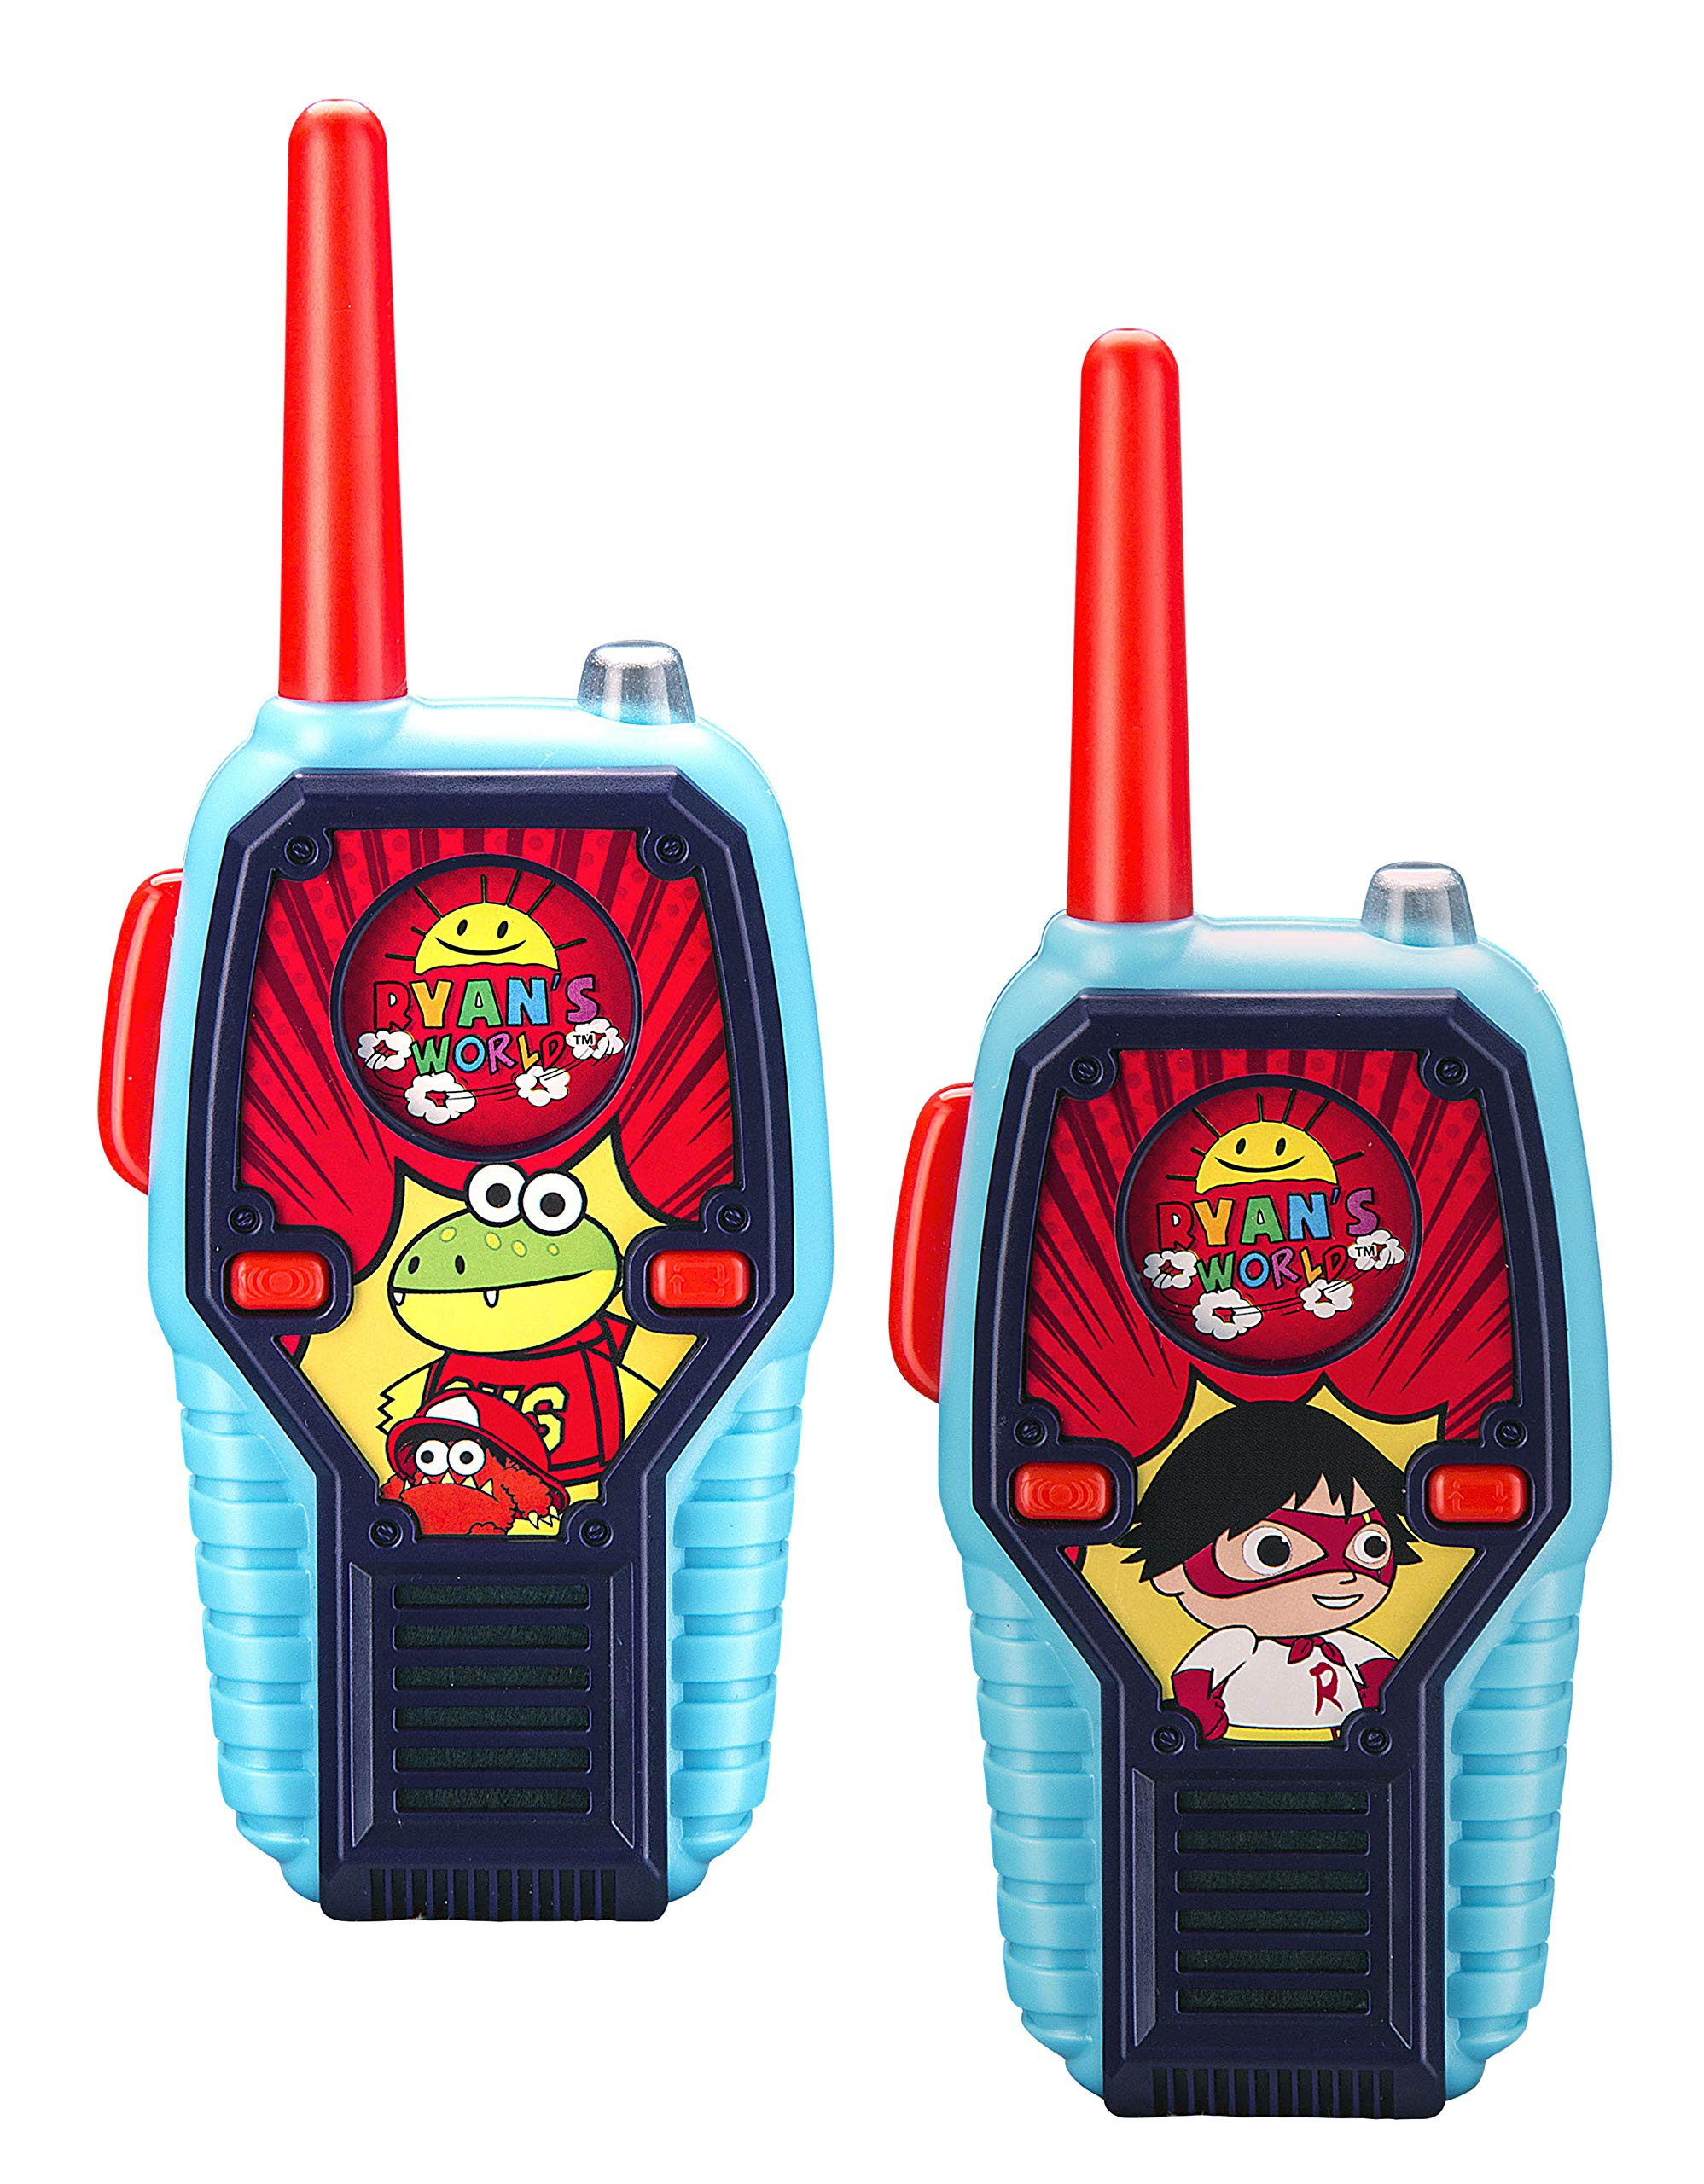 Walkie Talkies for Kids Ryans World Kids Walkie Talkies FRS Range Lights & Sound Kid Friendly Easy to Use for Indoor Outdoor Adventures by eKids (Image #1)